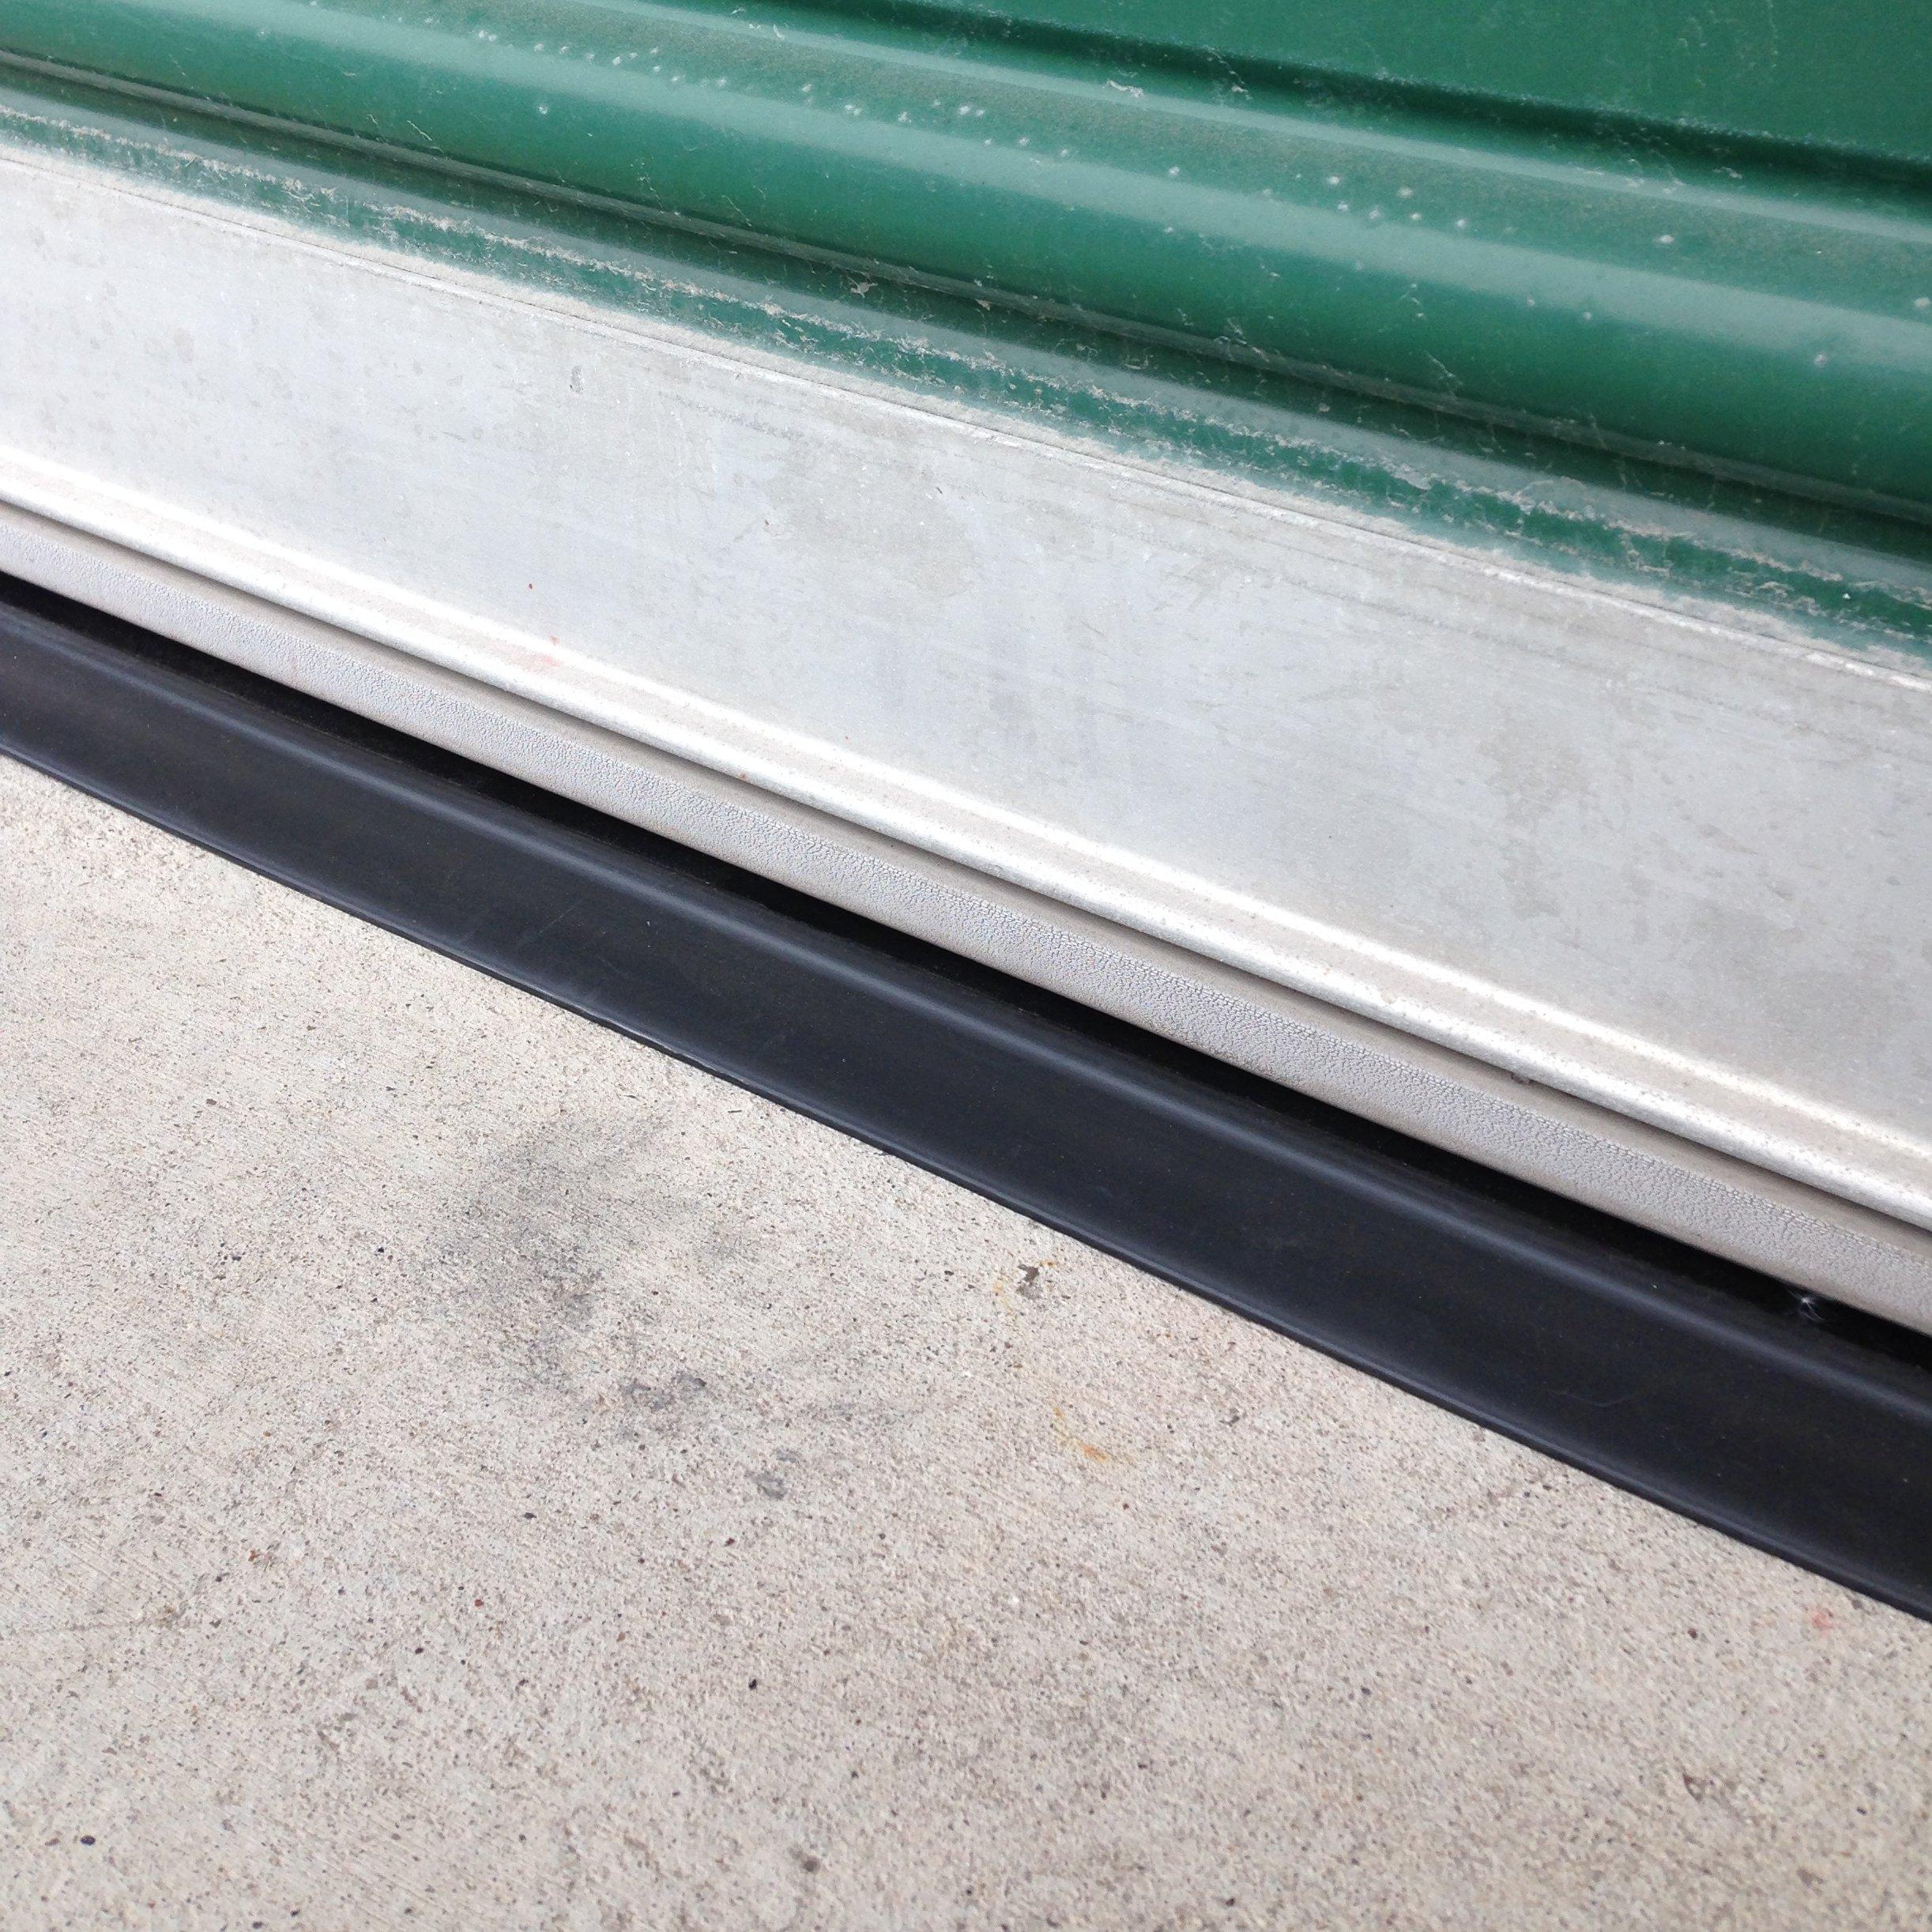 Garage Door Threshold | Xtreme Weather Guard Garage Door Threshold ...